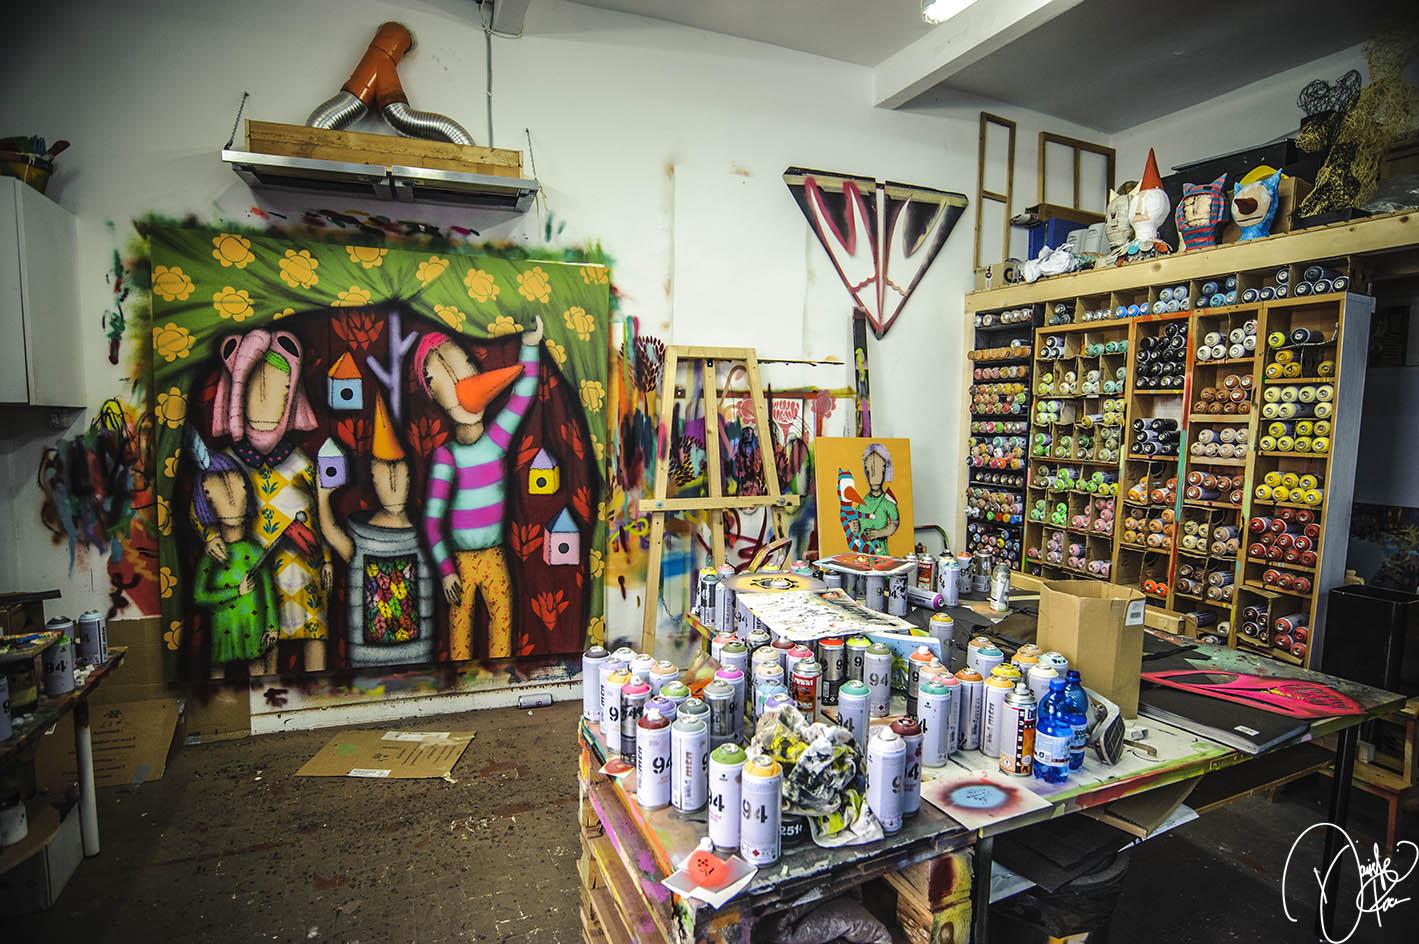 Tony Gallo Studio